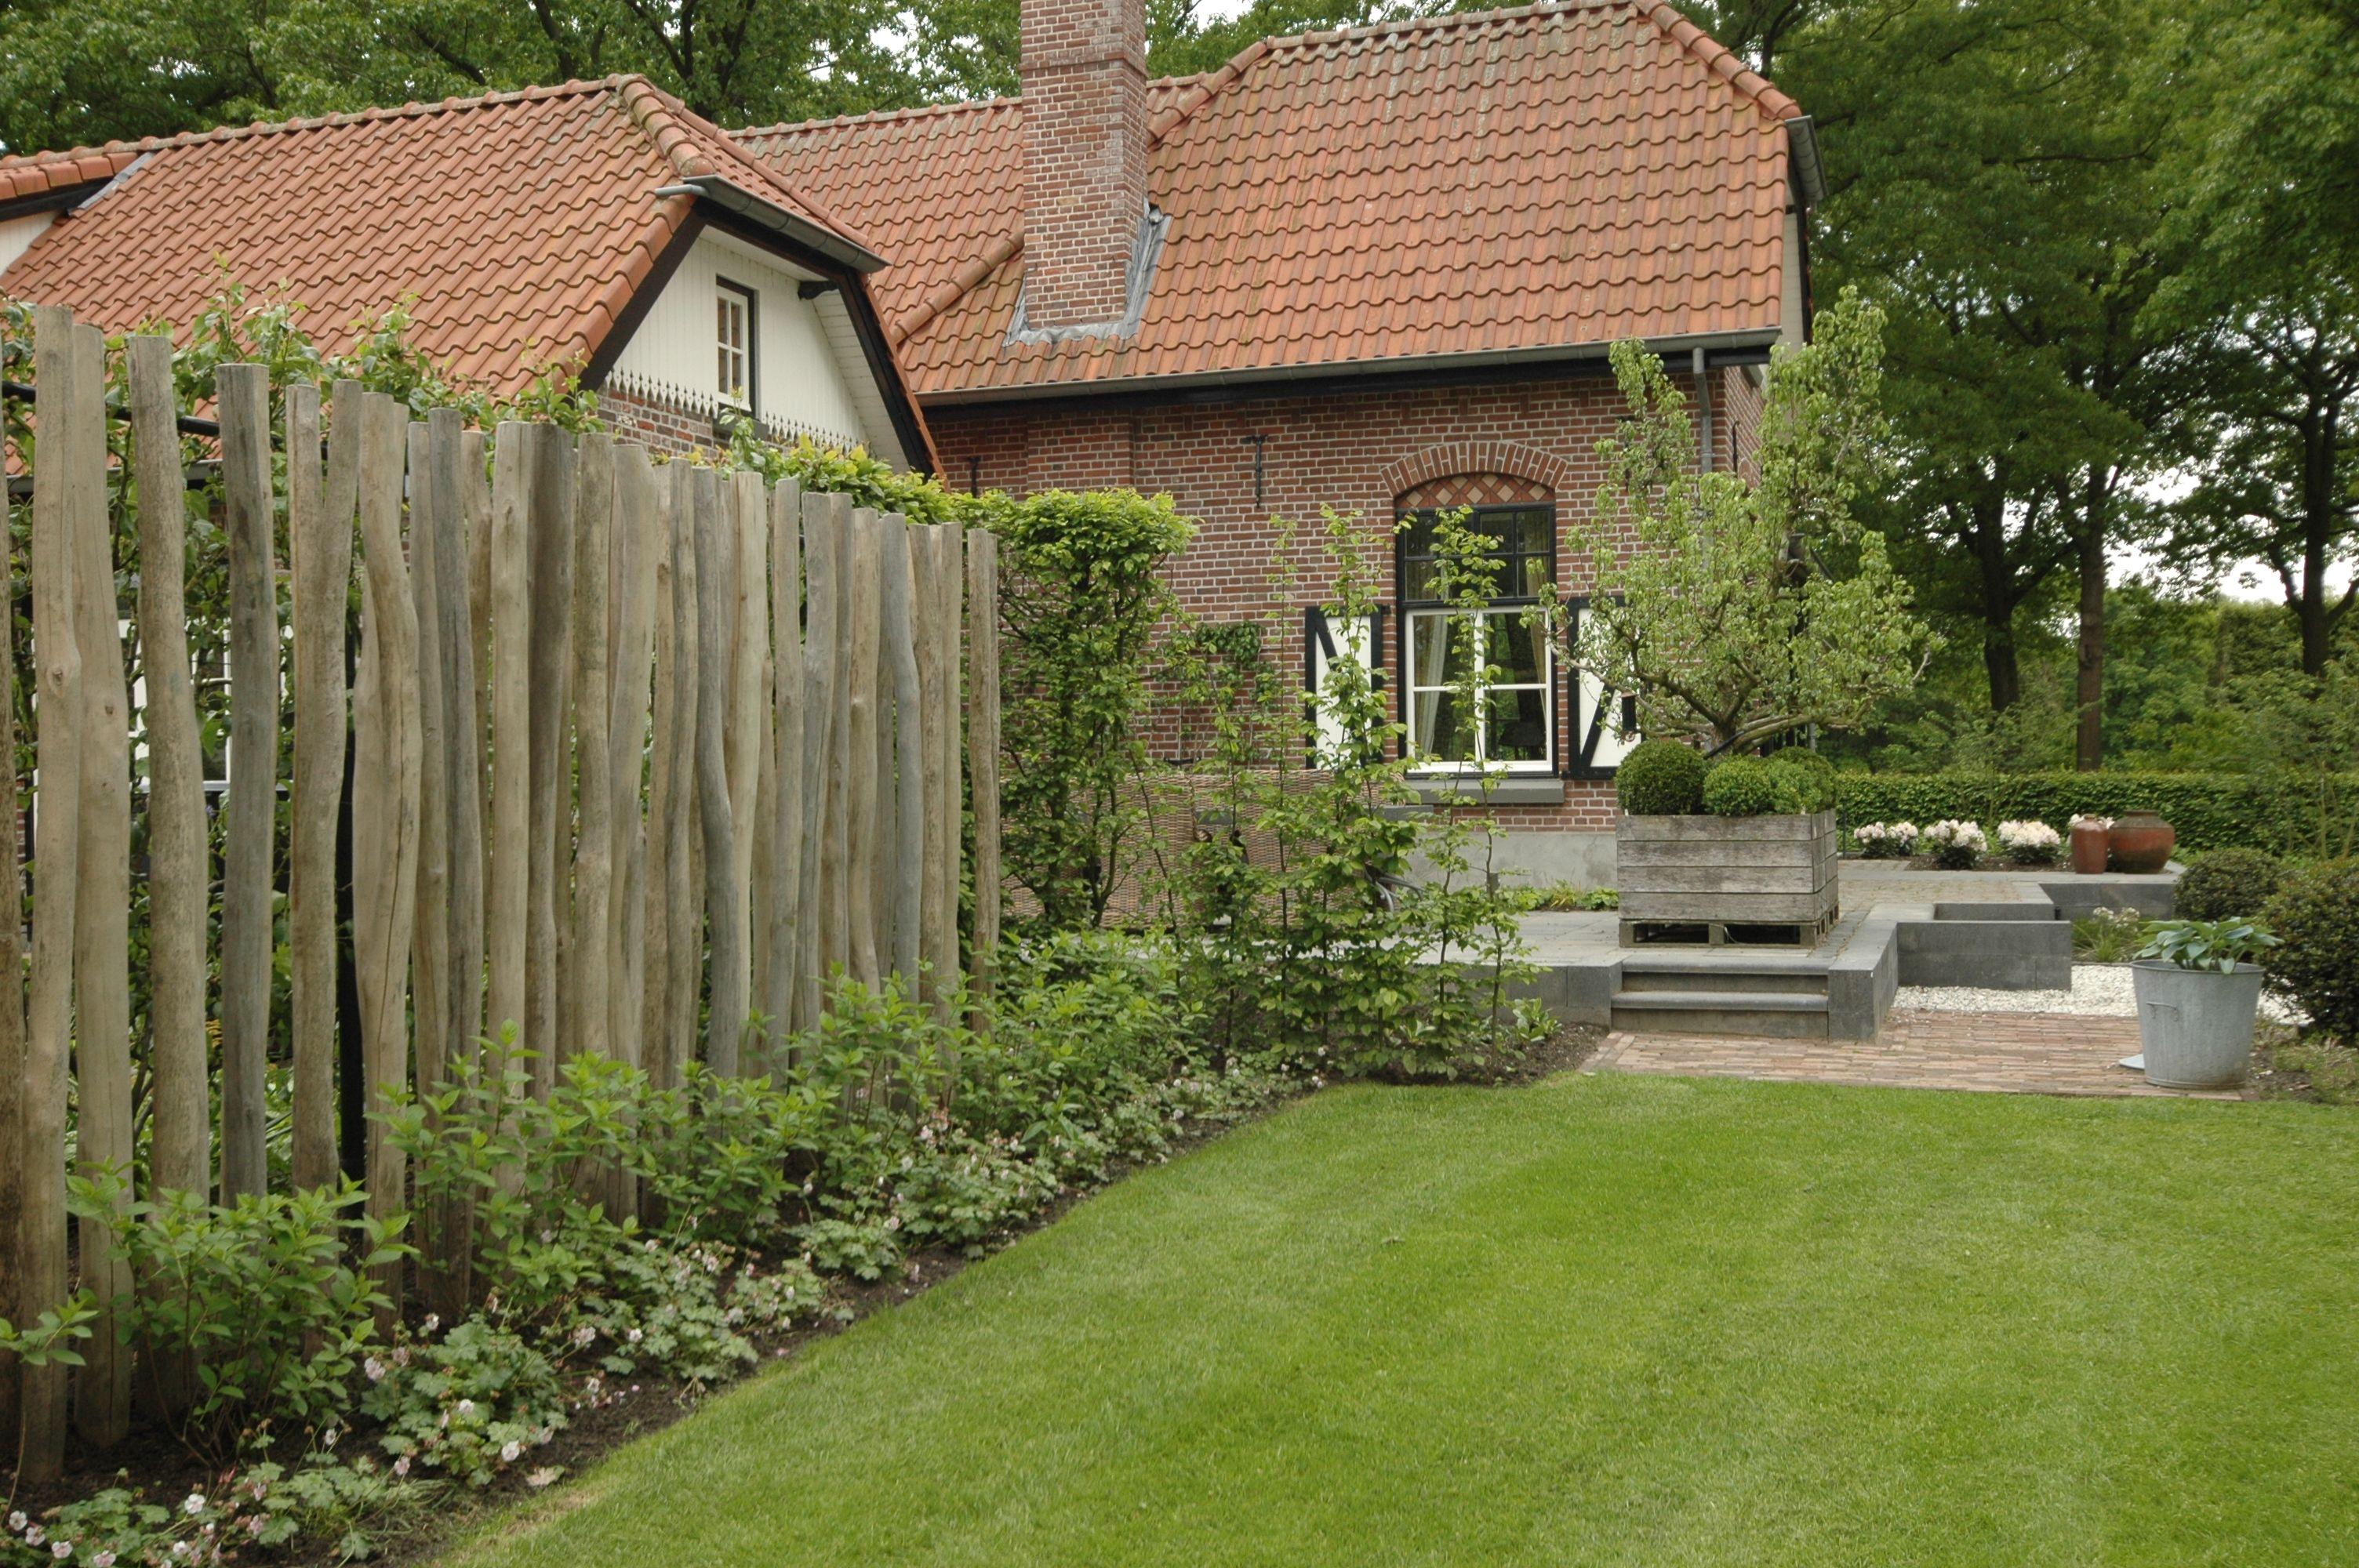 Houten Afscheiding Tuin : Ronde houten palen in tuin google zoeken cercos garden